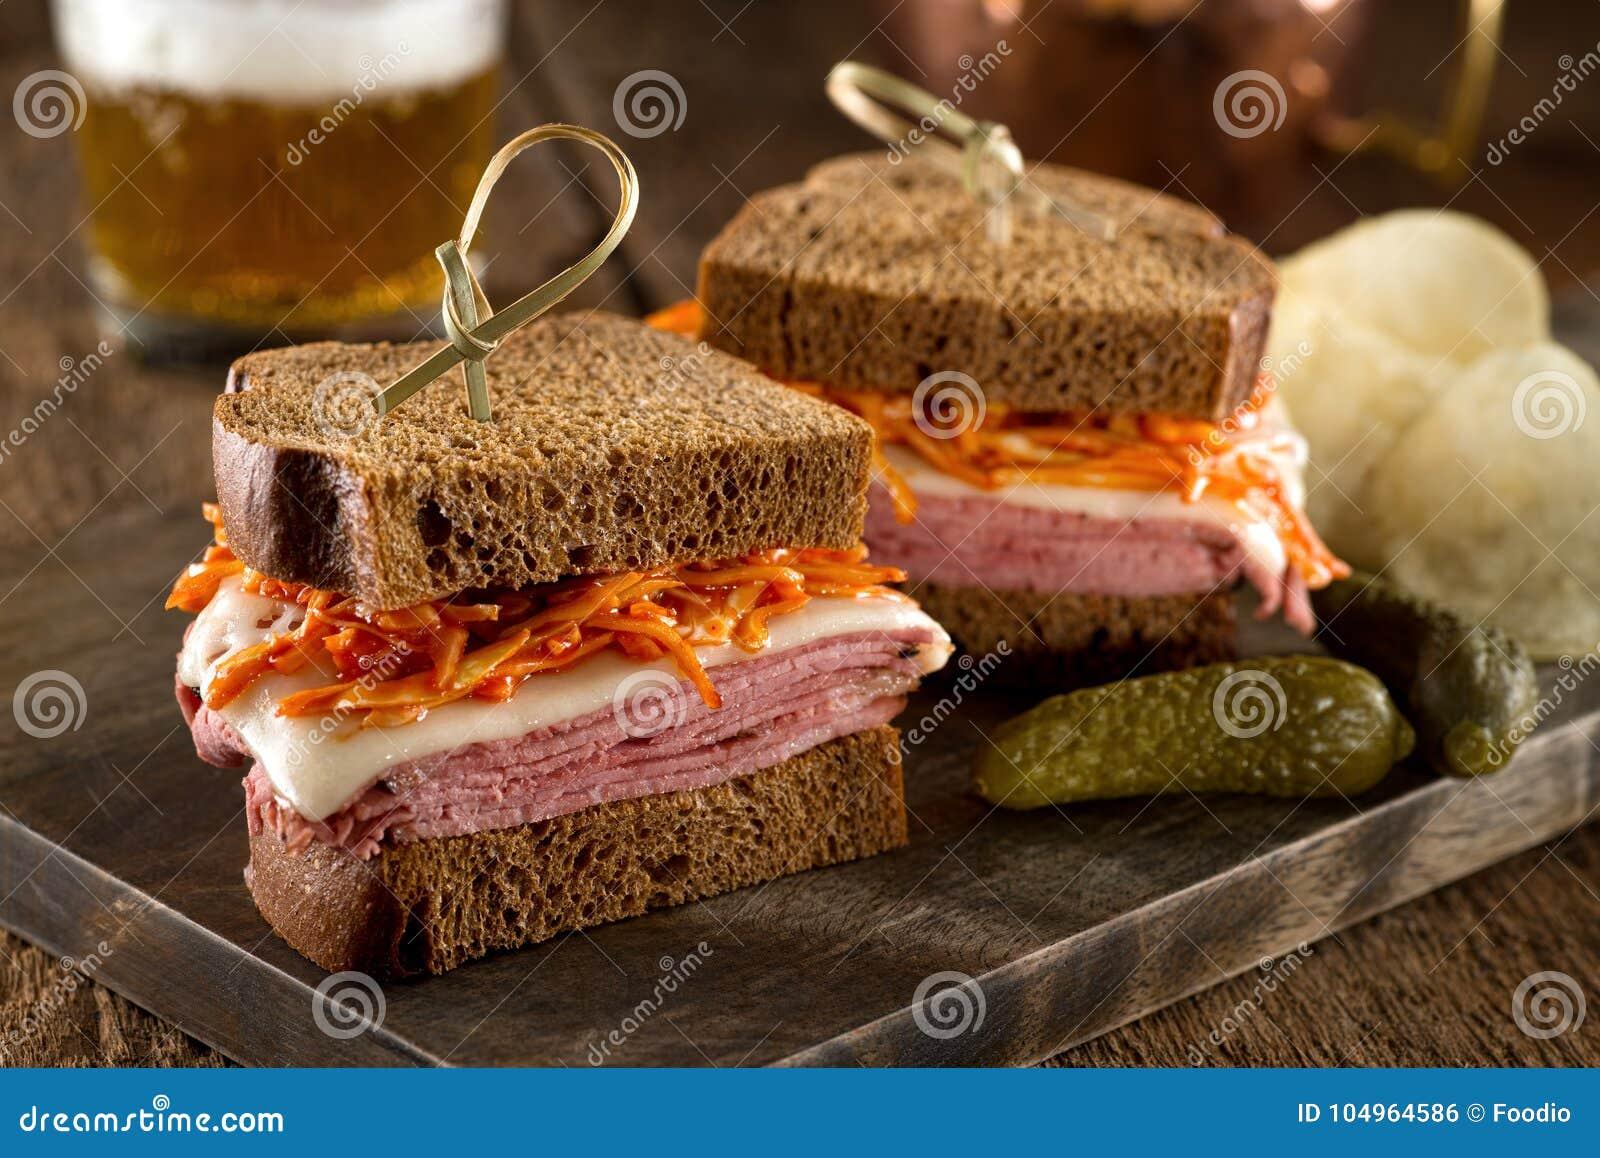 Smoked Meat on Rye Sandwich